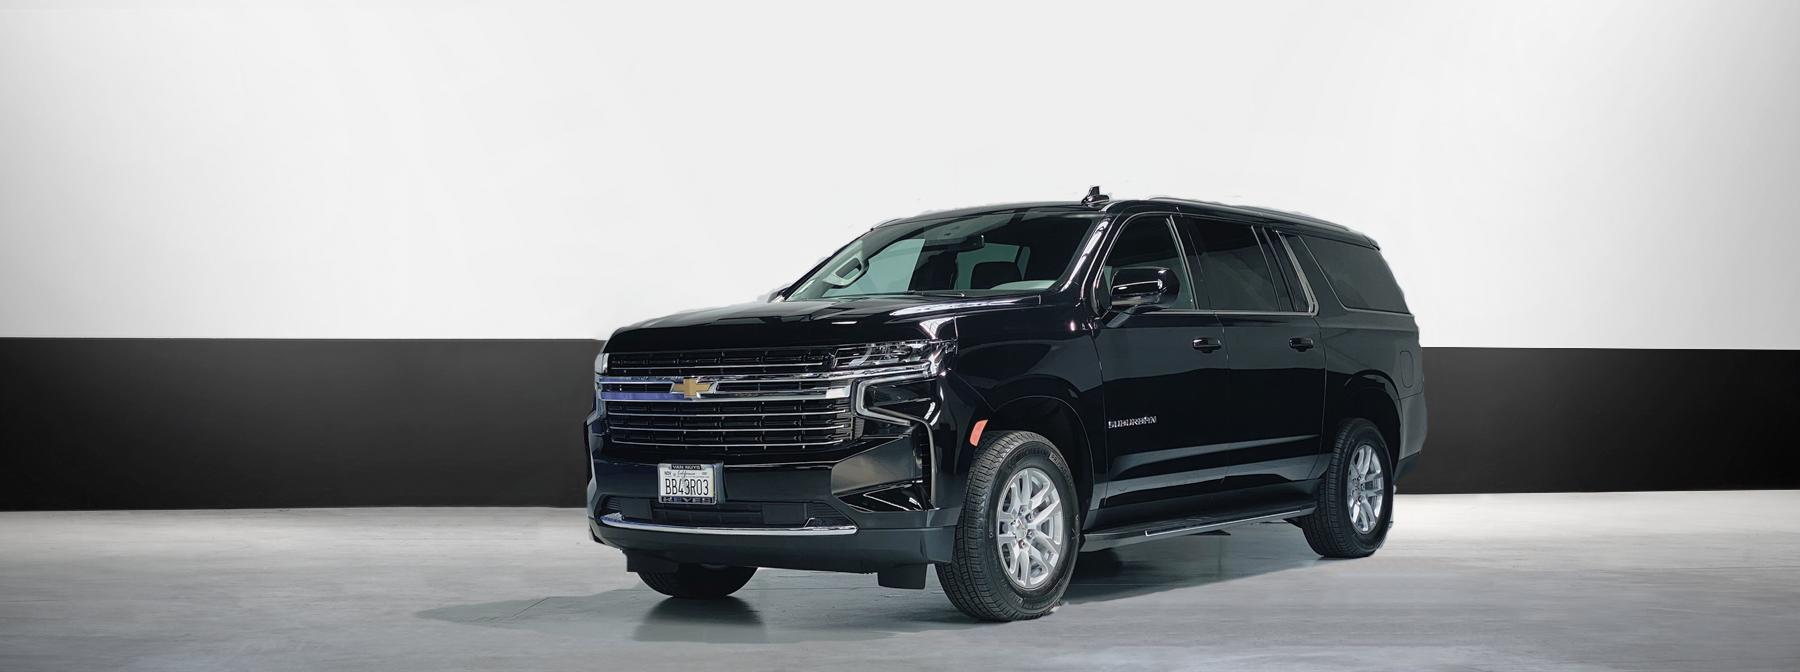 Chevrolet suburban luxury suv rental in black